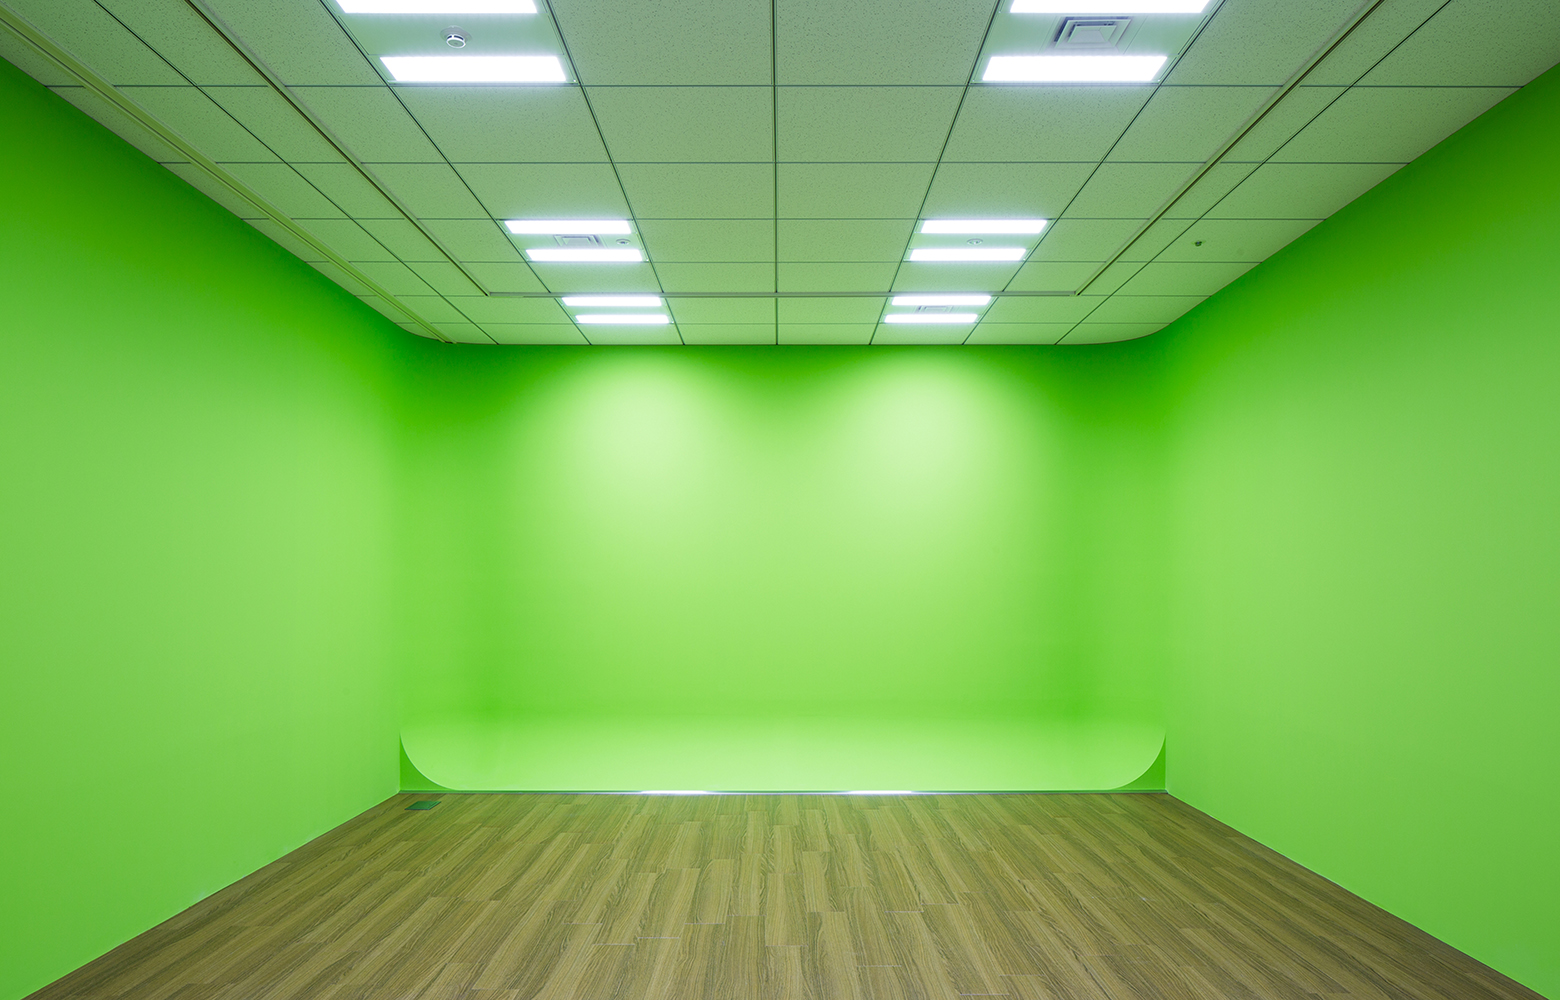 KLab株式会社 Roppongi Office Photographing studio デザイン・レイアウト事例